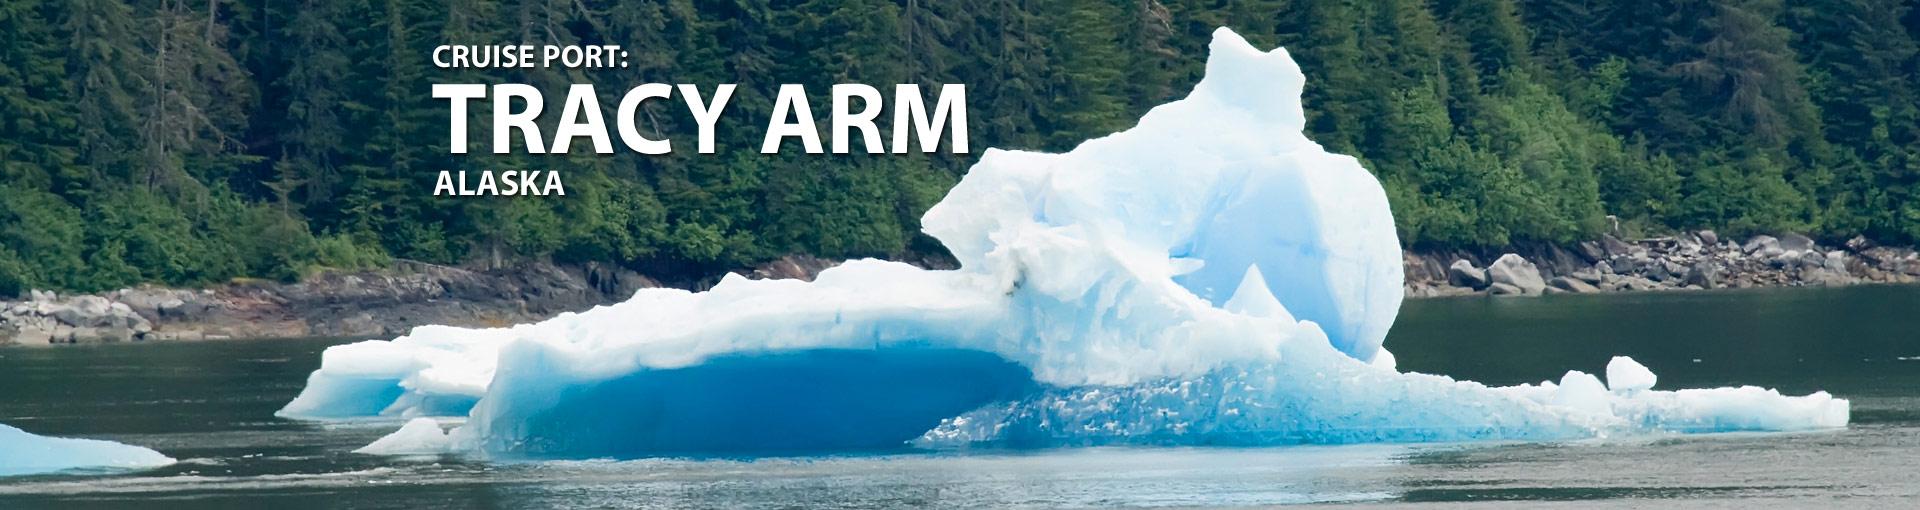 Cruise Port: Tracy Arm Fjord, Alaska